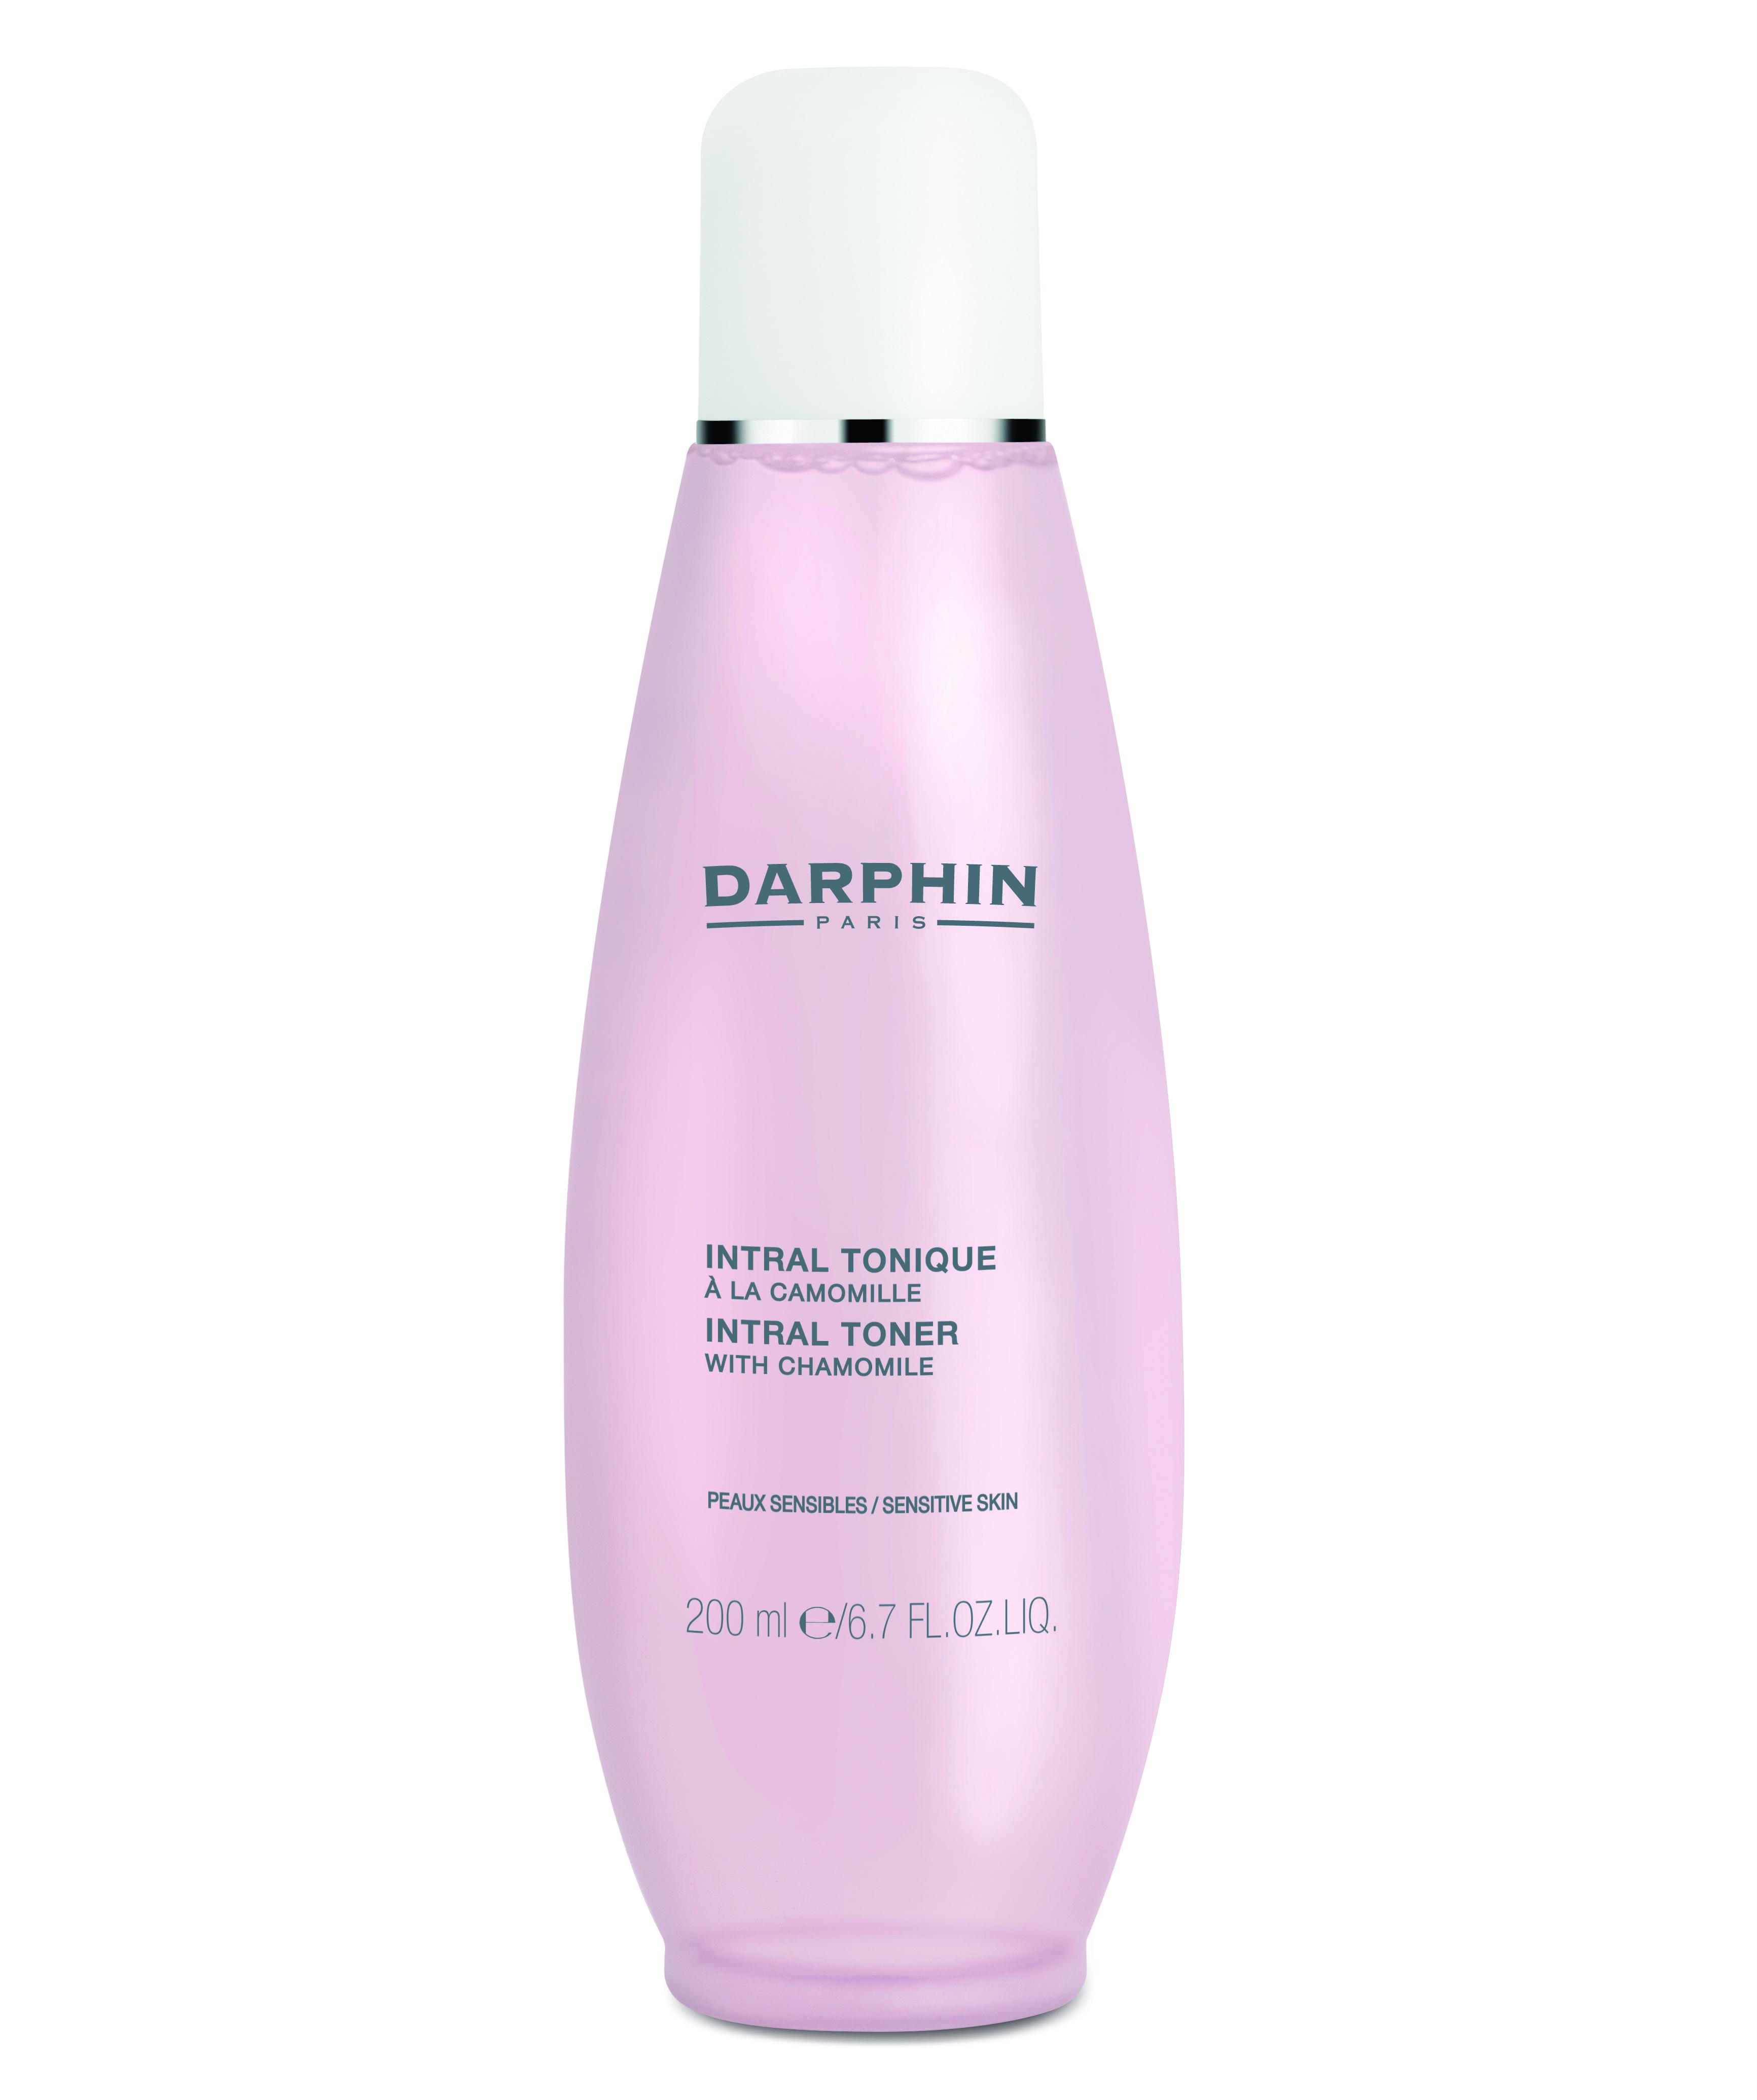 Darphin Intral Toner with Chamomile Sensitive Skin Απαλή Τονοτική Λοσιόν για Ευαίσθητο Δέρμα με Τάση για Κοκινίλες 200ml